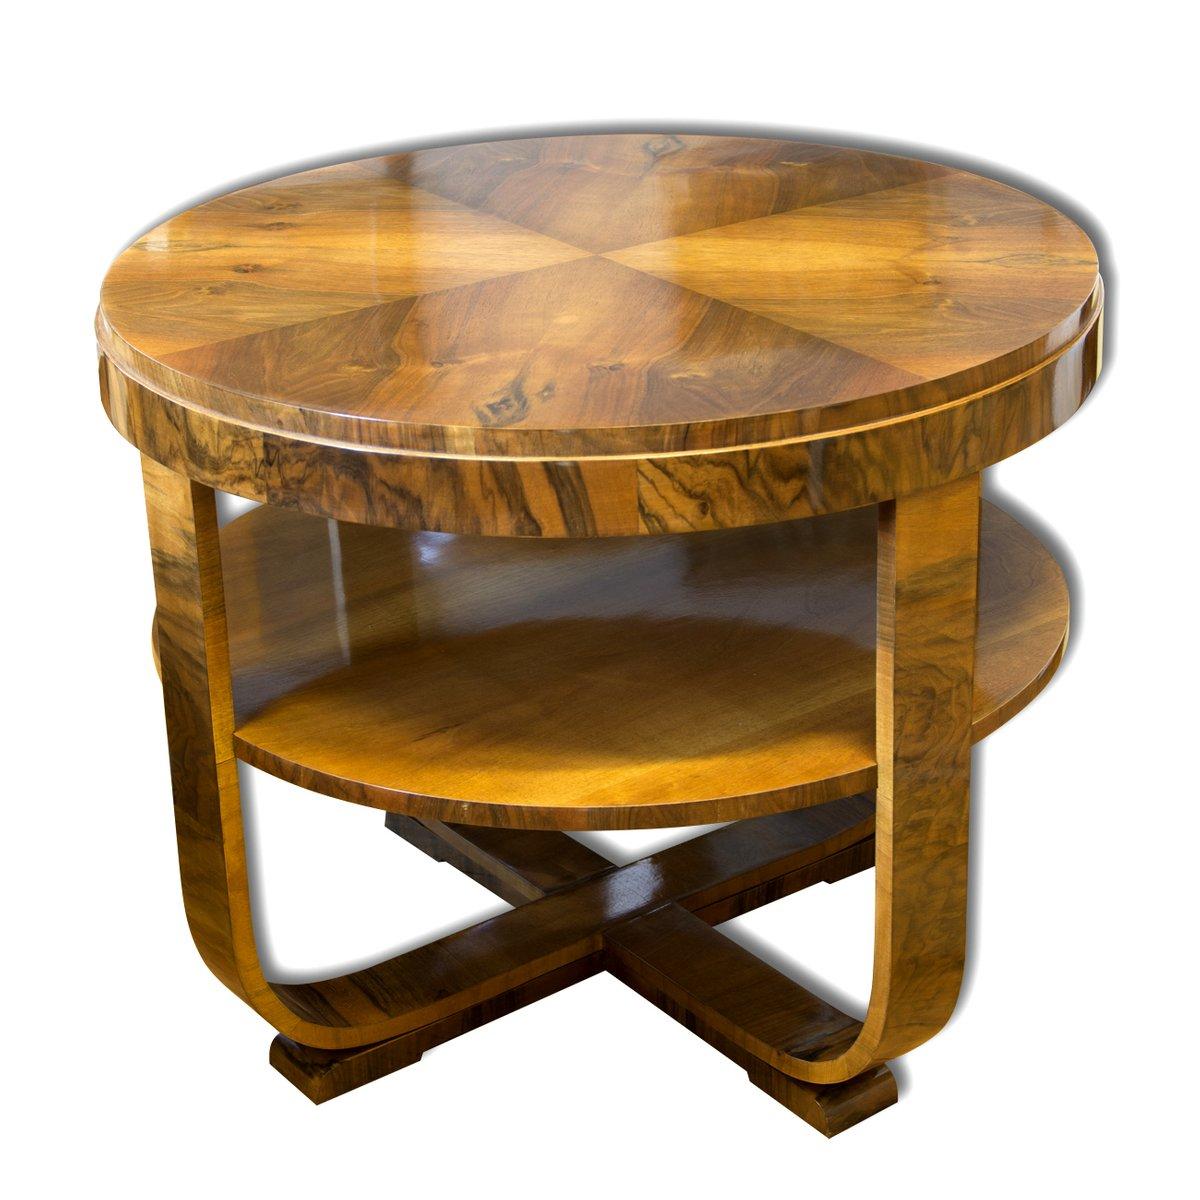 table basse tch que en noyer par jindrich halabala 1930s en vente sur pamono. Black Bedroom Furniture Sets. Home Design Ideas